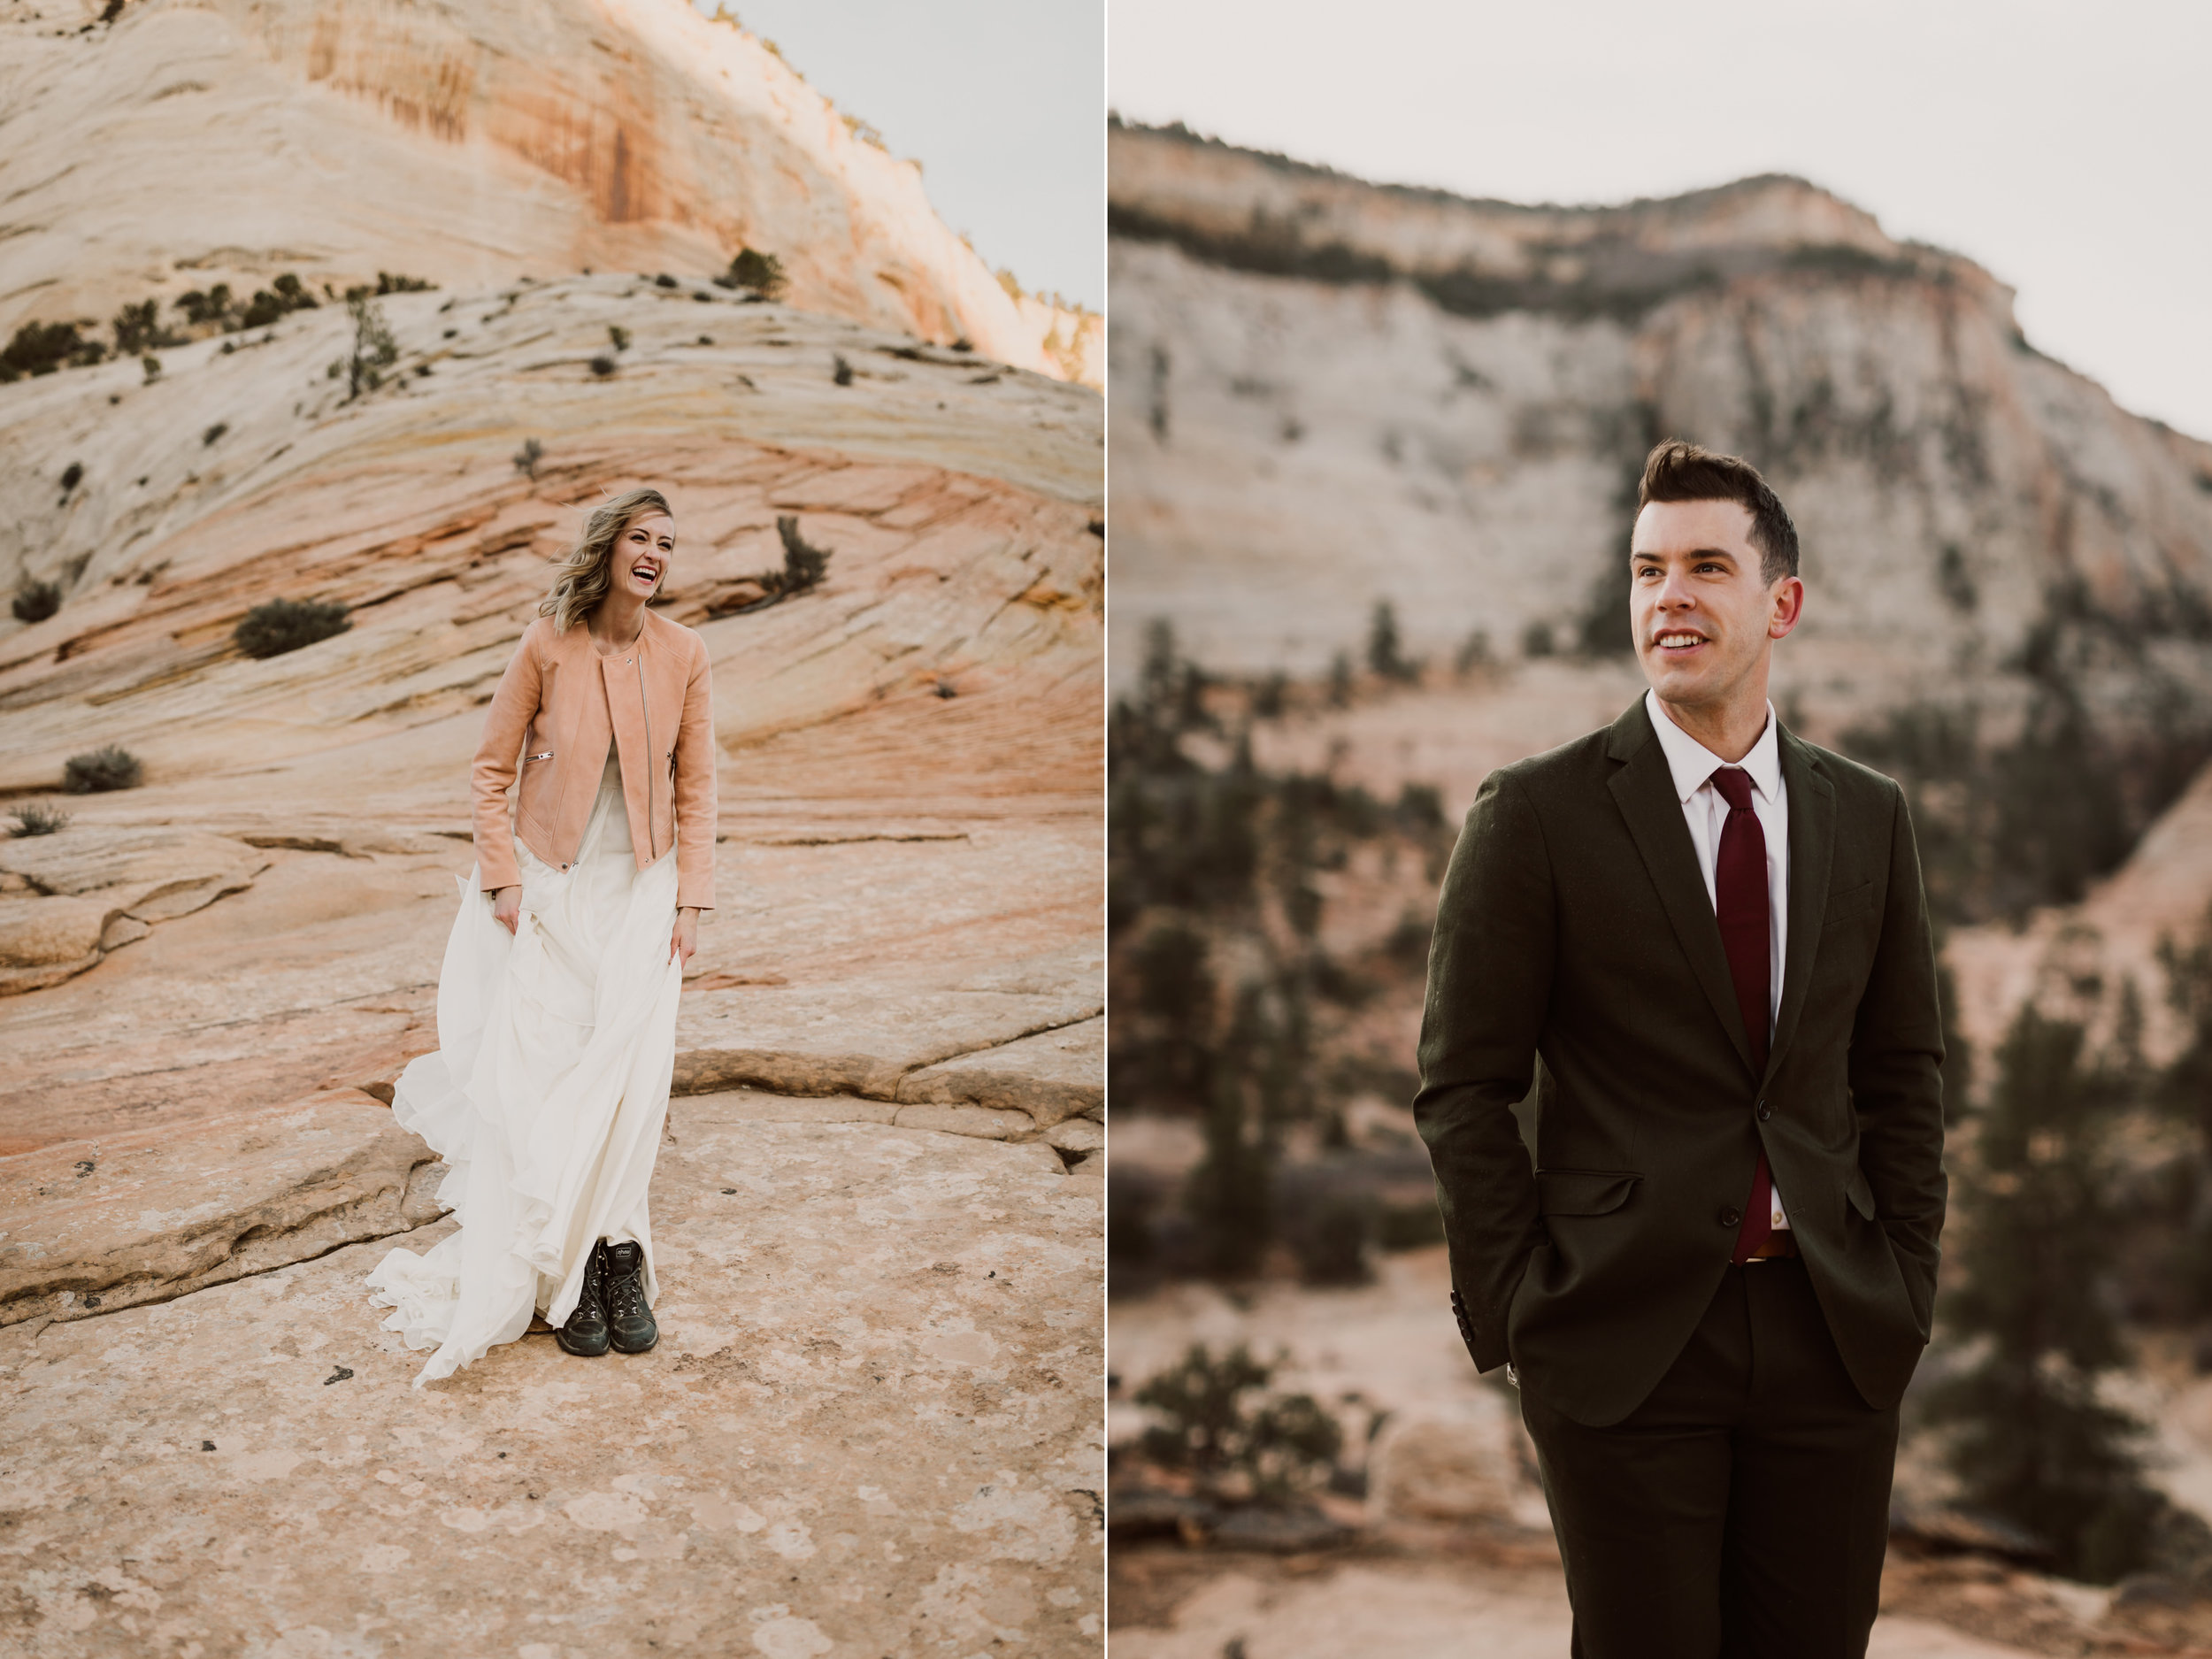 zion-national-park-wedding-155.jpg